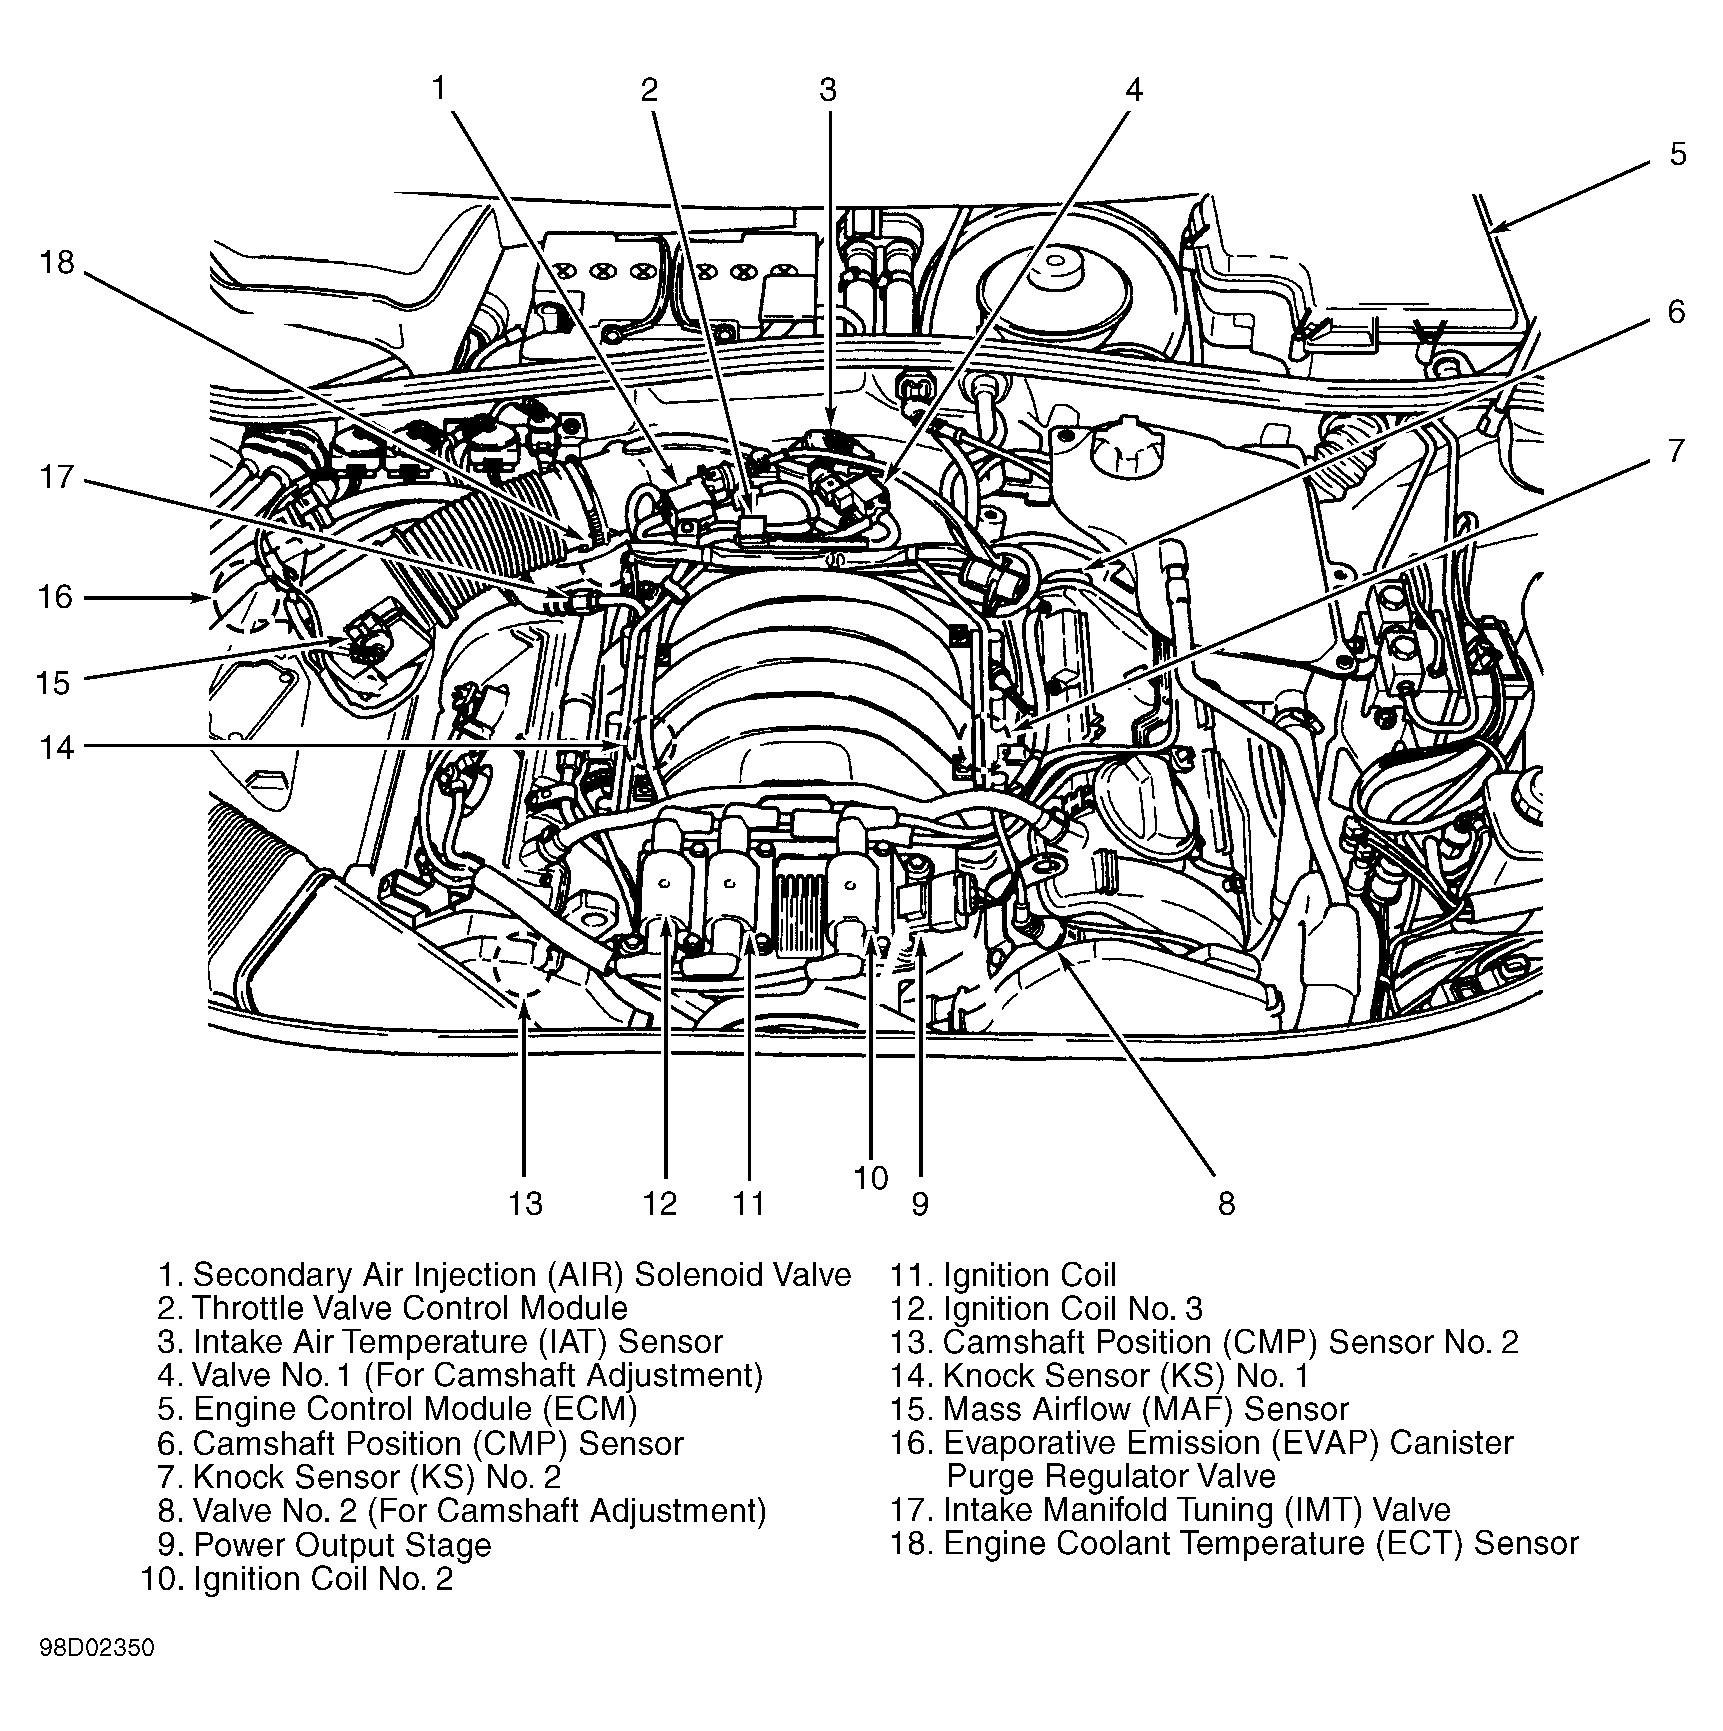 Wiring Diagram Image Details 2002 Chrysler Sebring Ignition Wiring - Meta  Wiring DiagramsMeta Wiring Diagrams